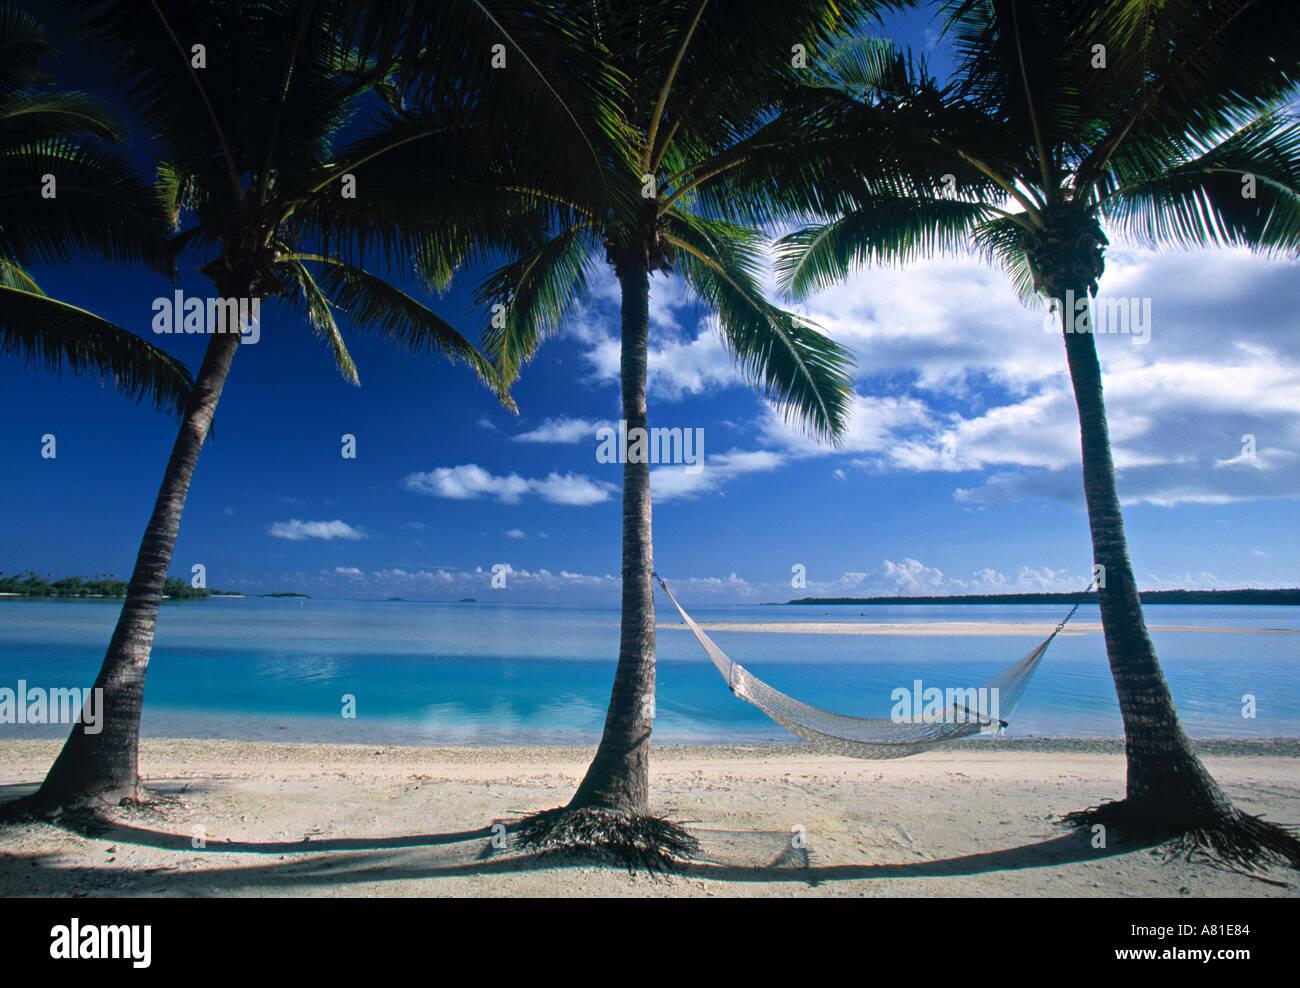 Palms and Hammock, Akitua Motu, Aitutaki, Cook Islands - Stock Image